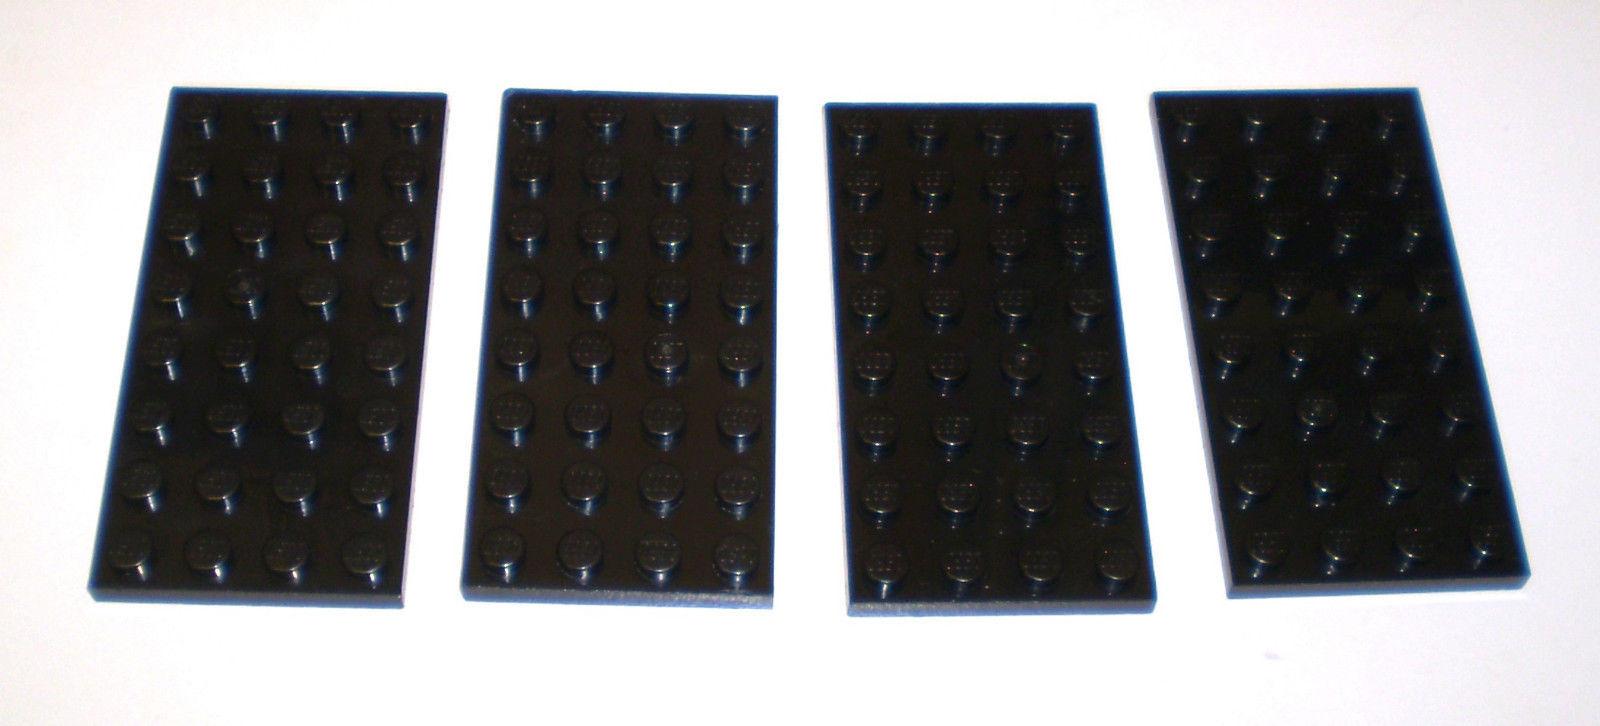 BLACK 2x6 Stud Plates Building 3795 NEW LEGO 30